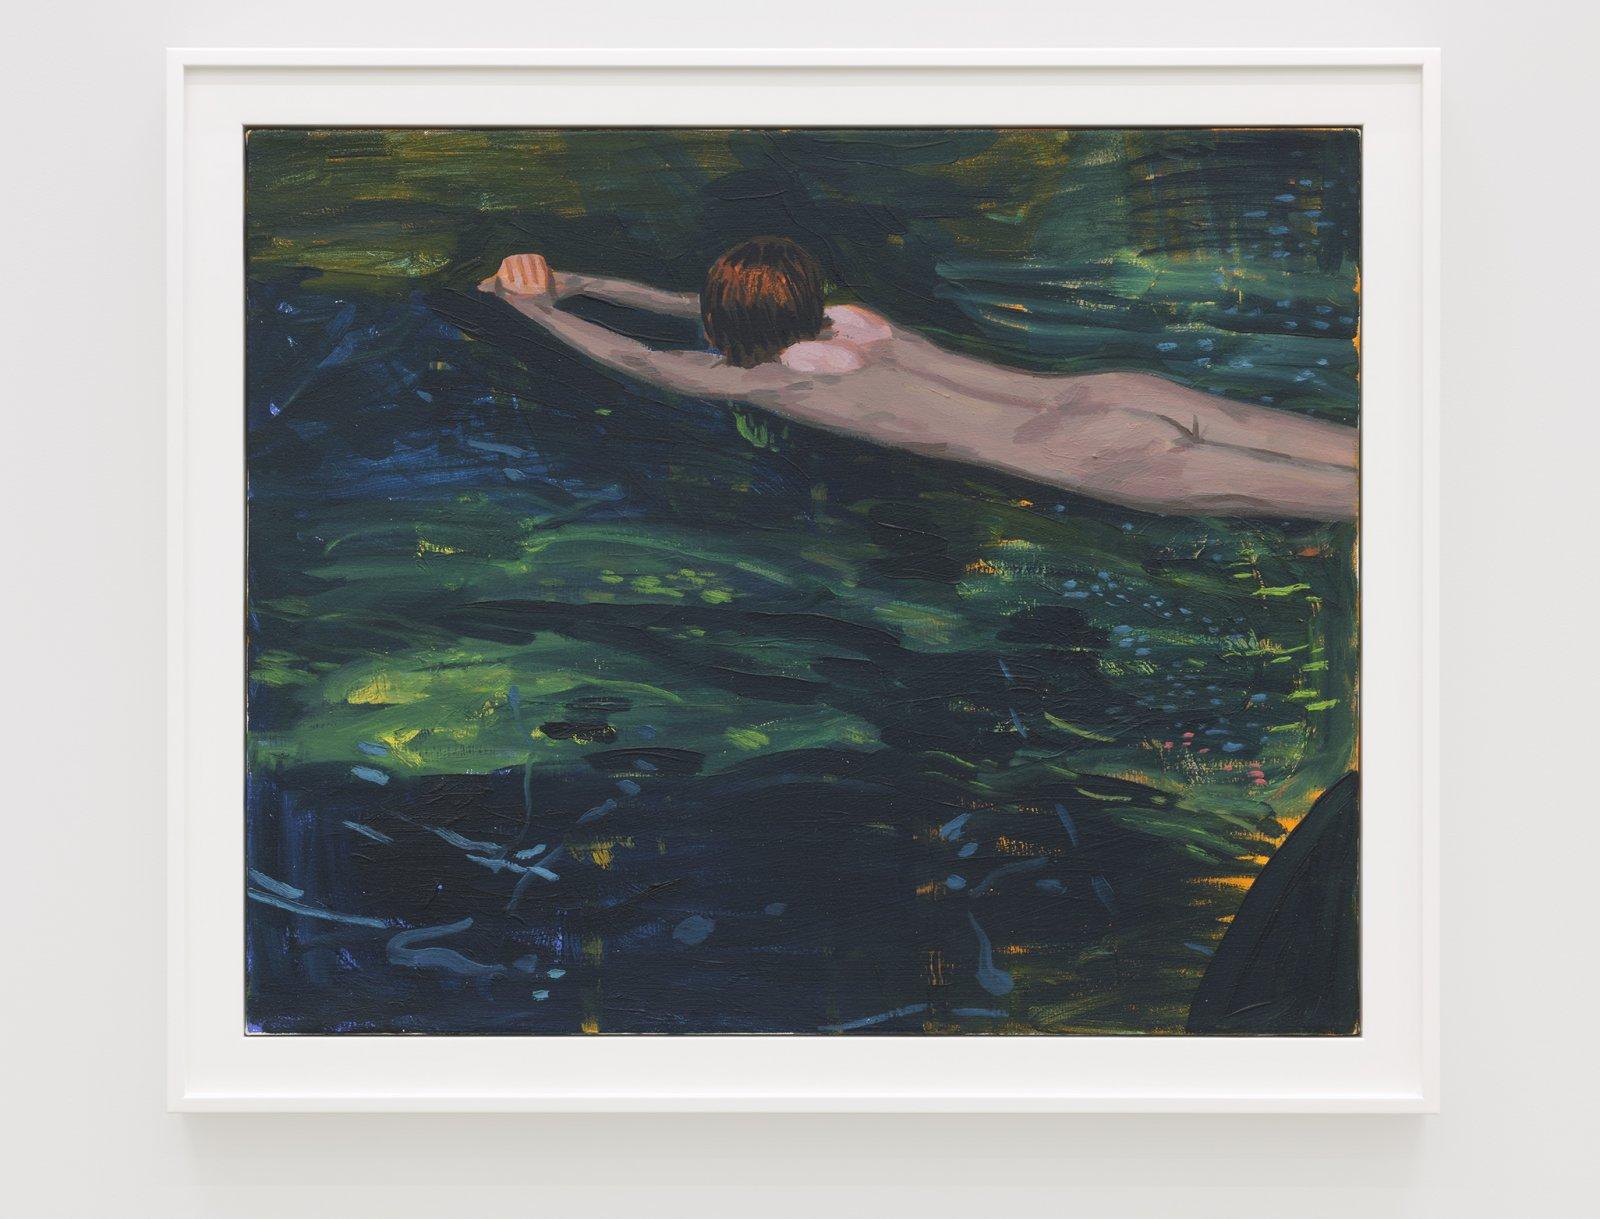 Damian Moppett, Untitled (Green Swimming), 2020, oil on canvas, 27 x 32 in. (69 x 82 cm) by Damian Moppett